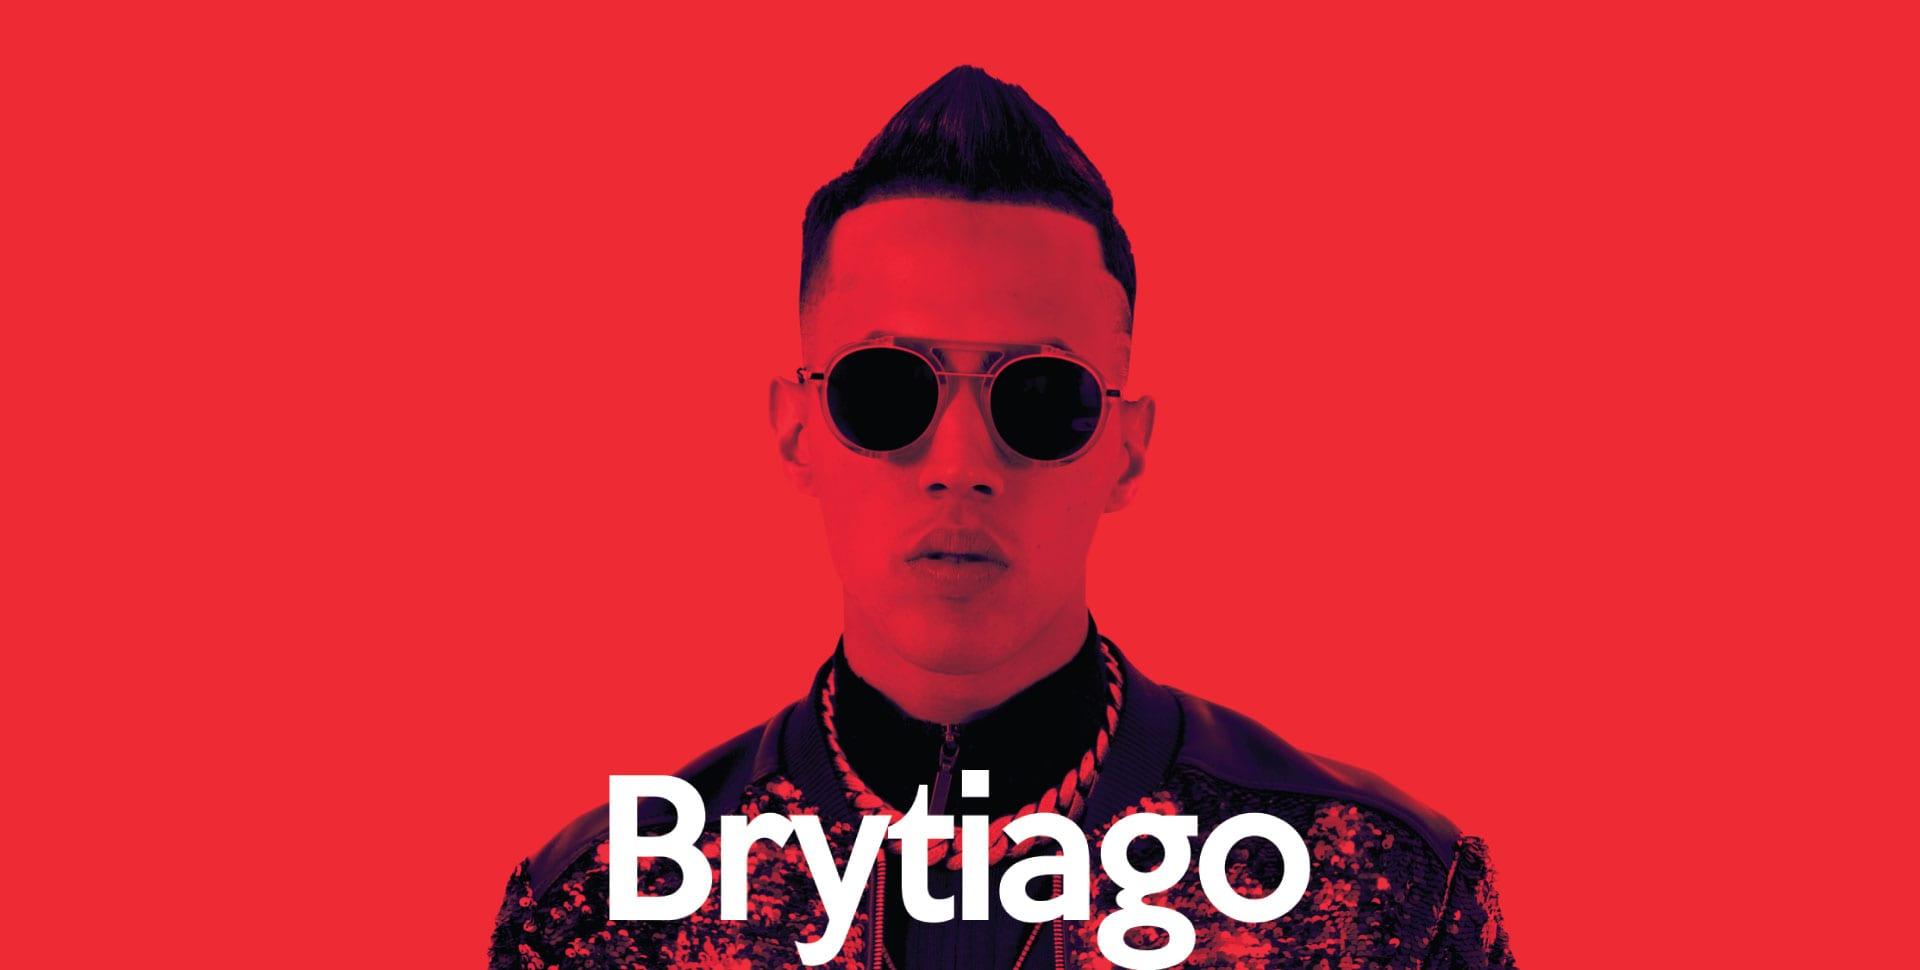 Brytiago 2heart